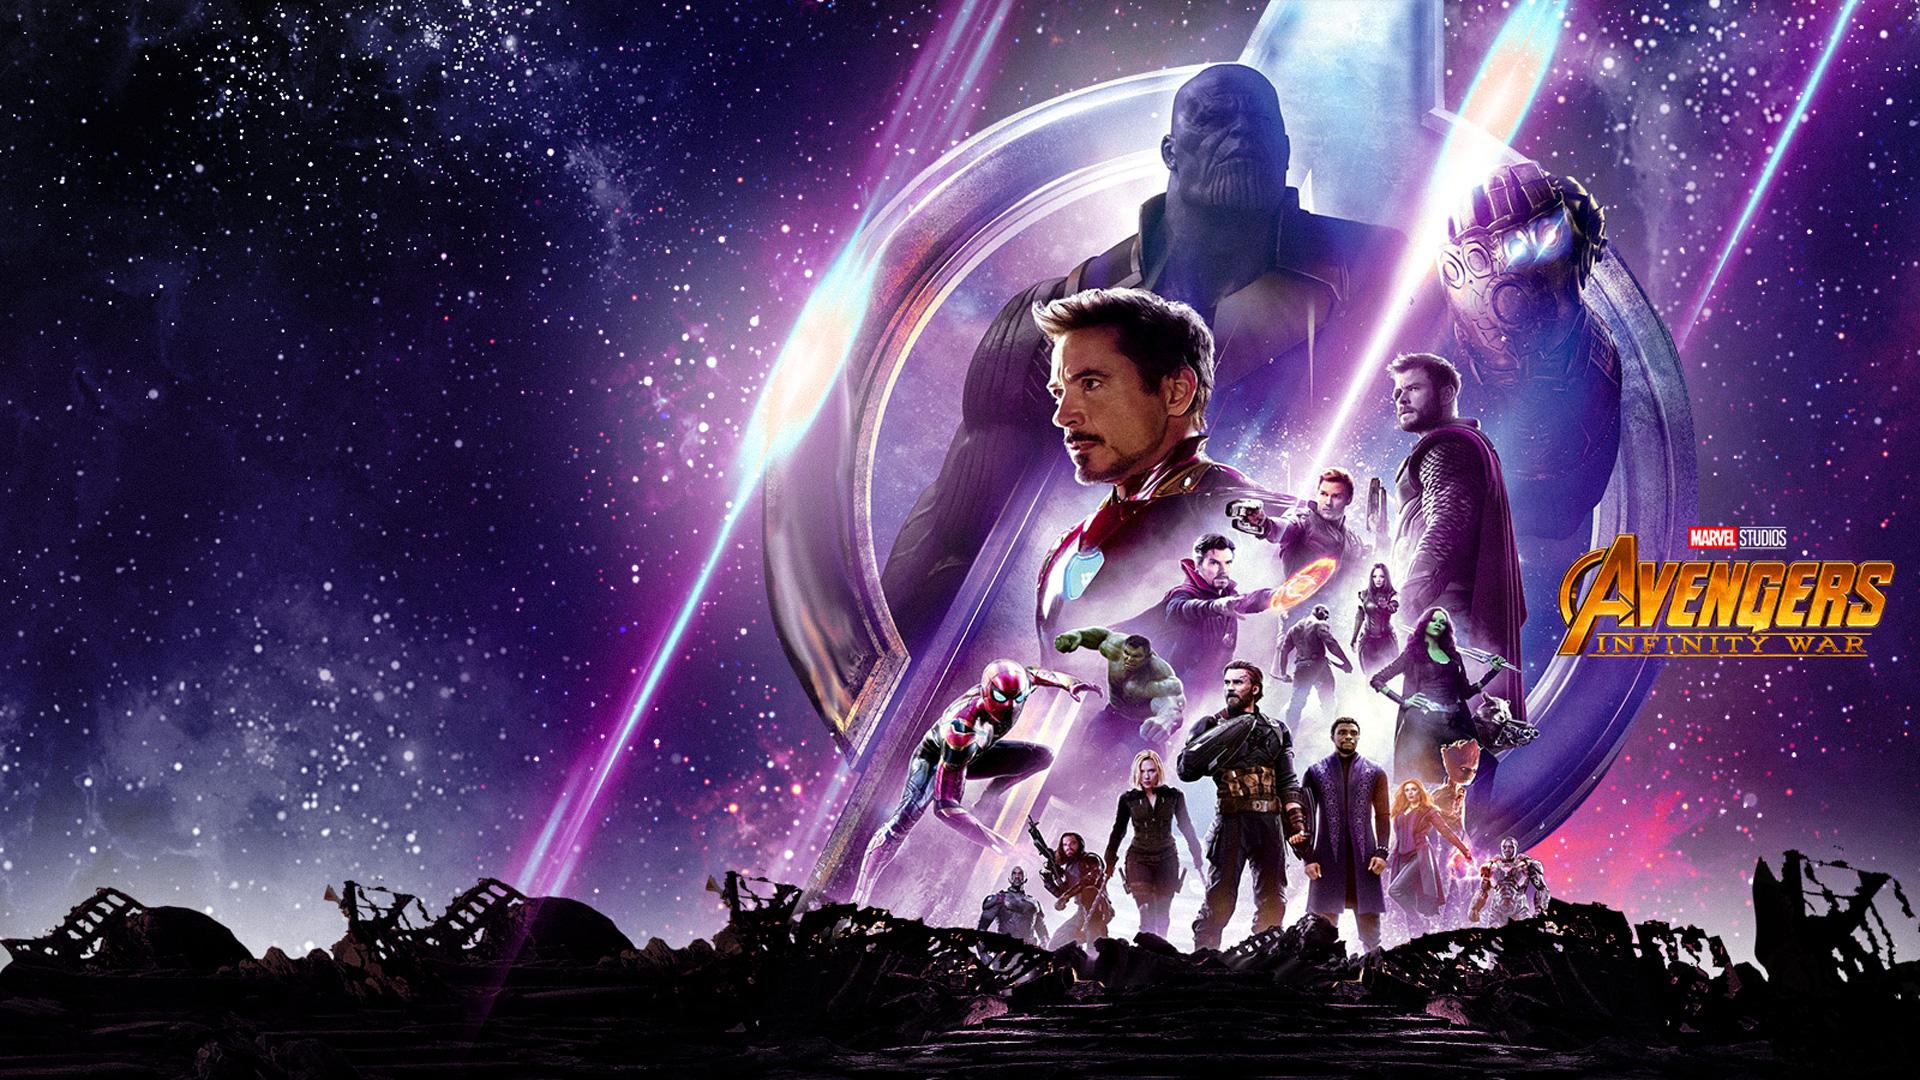 Avengers Infinity War Fondo De Pantalla Hd Fondo De